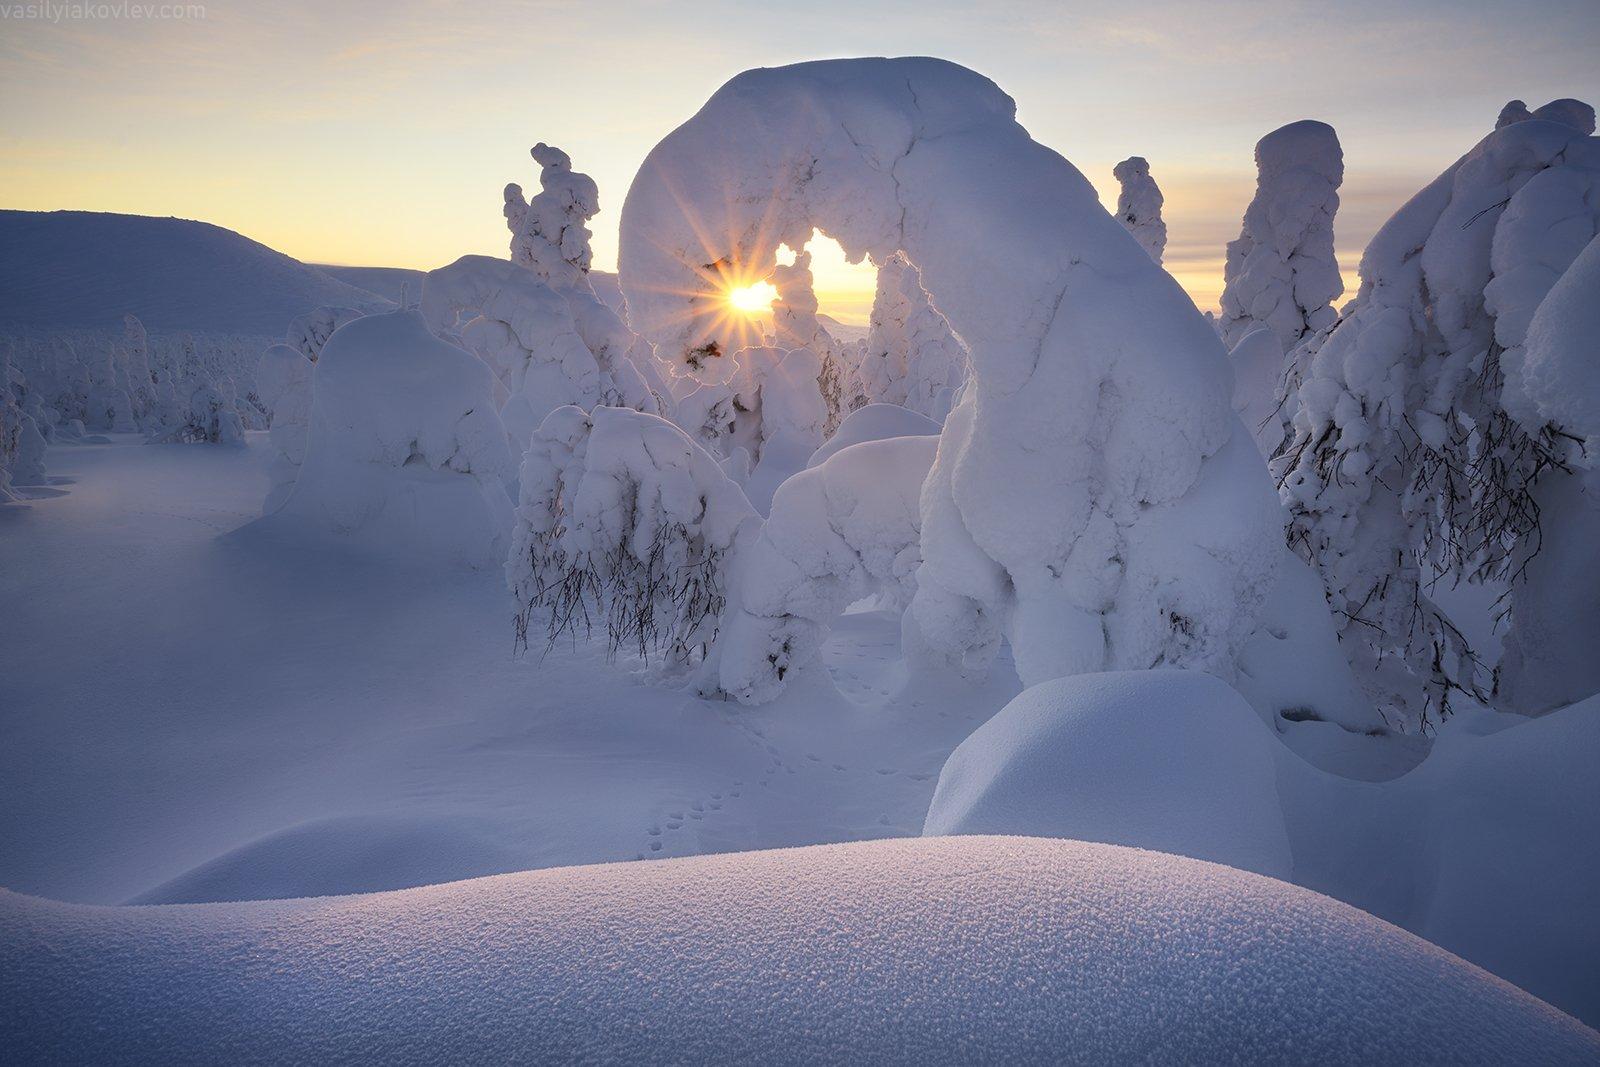 гух, урал, зима, россия, горы, снег, василийяковлев, яковлевфототур, Василий Яковлев